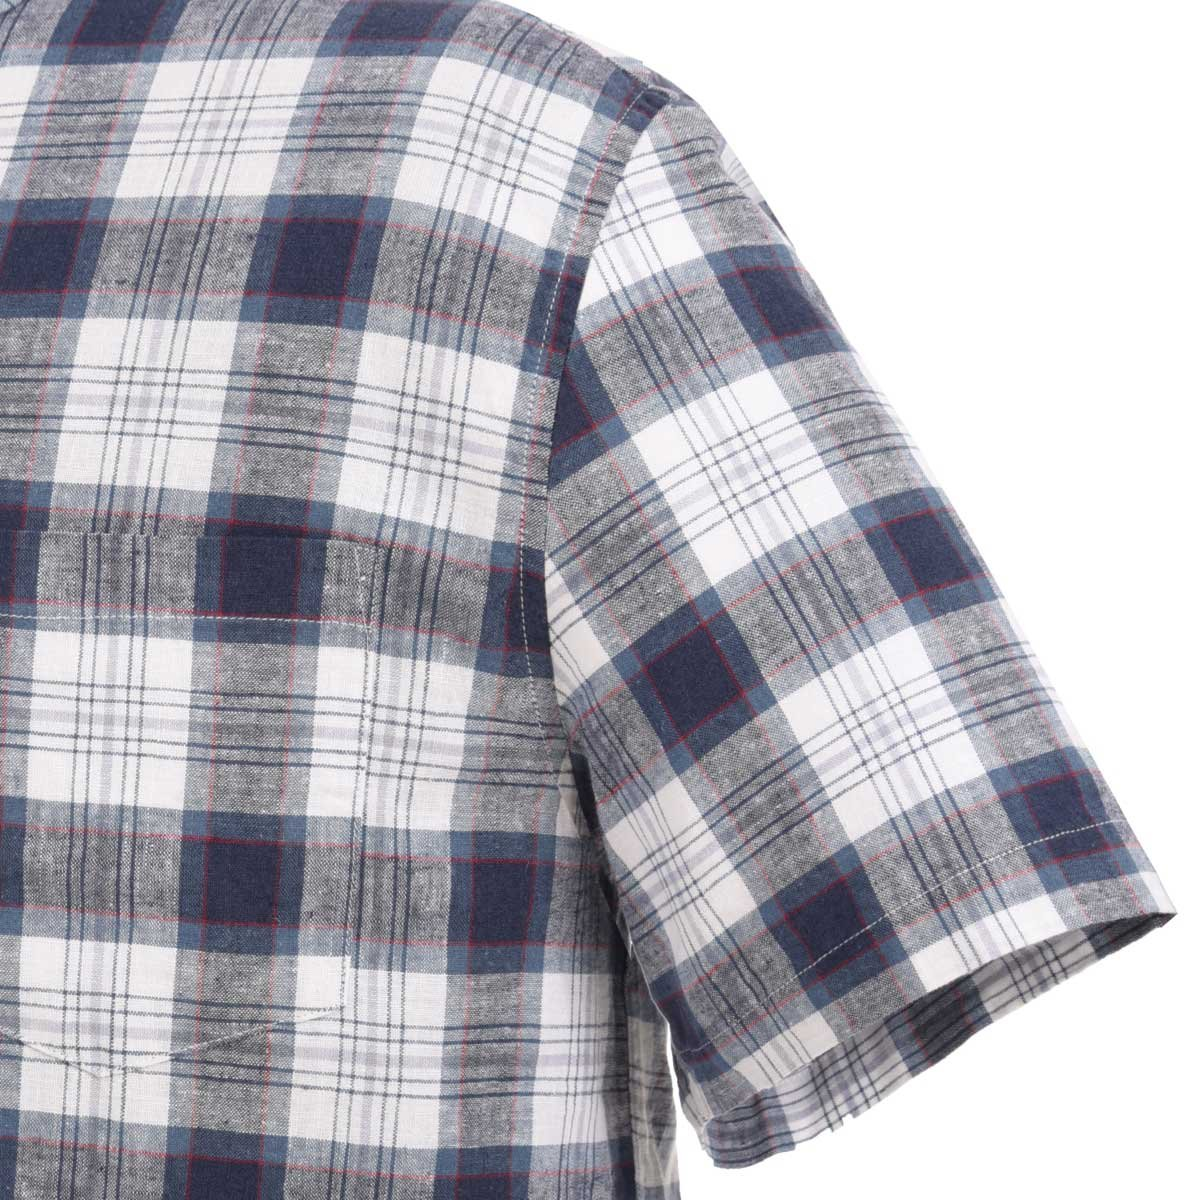 Camisa Cuadros Grandes Manga Corta J. Opus Plus